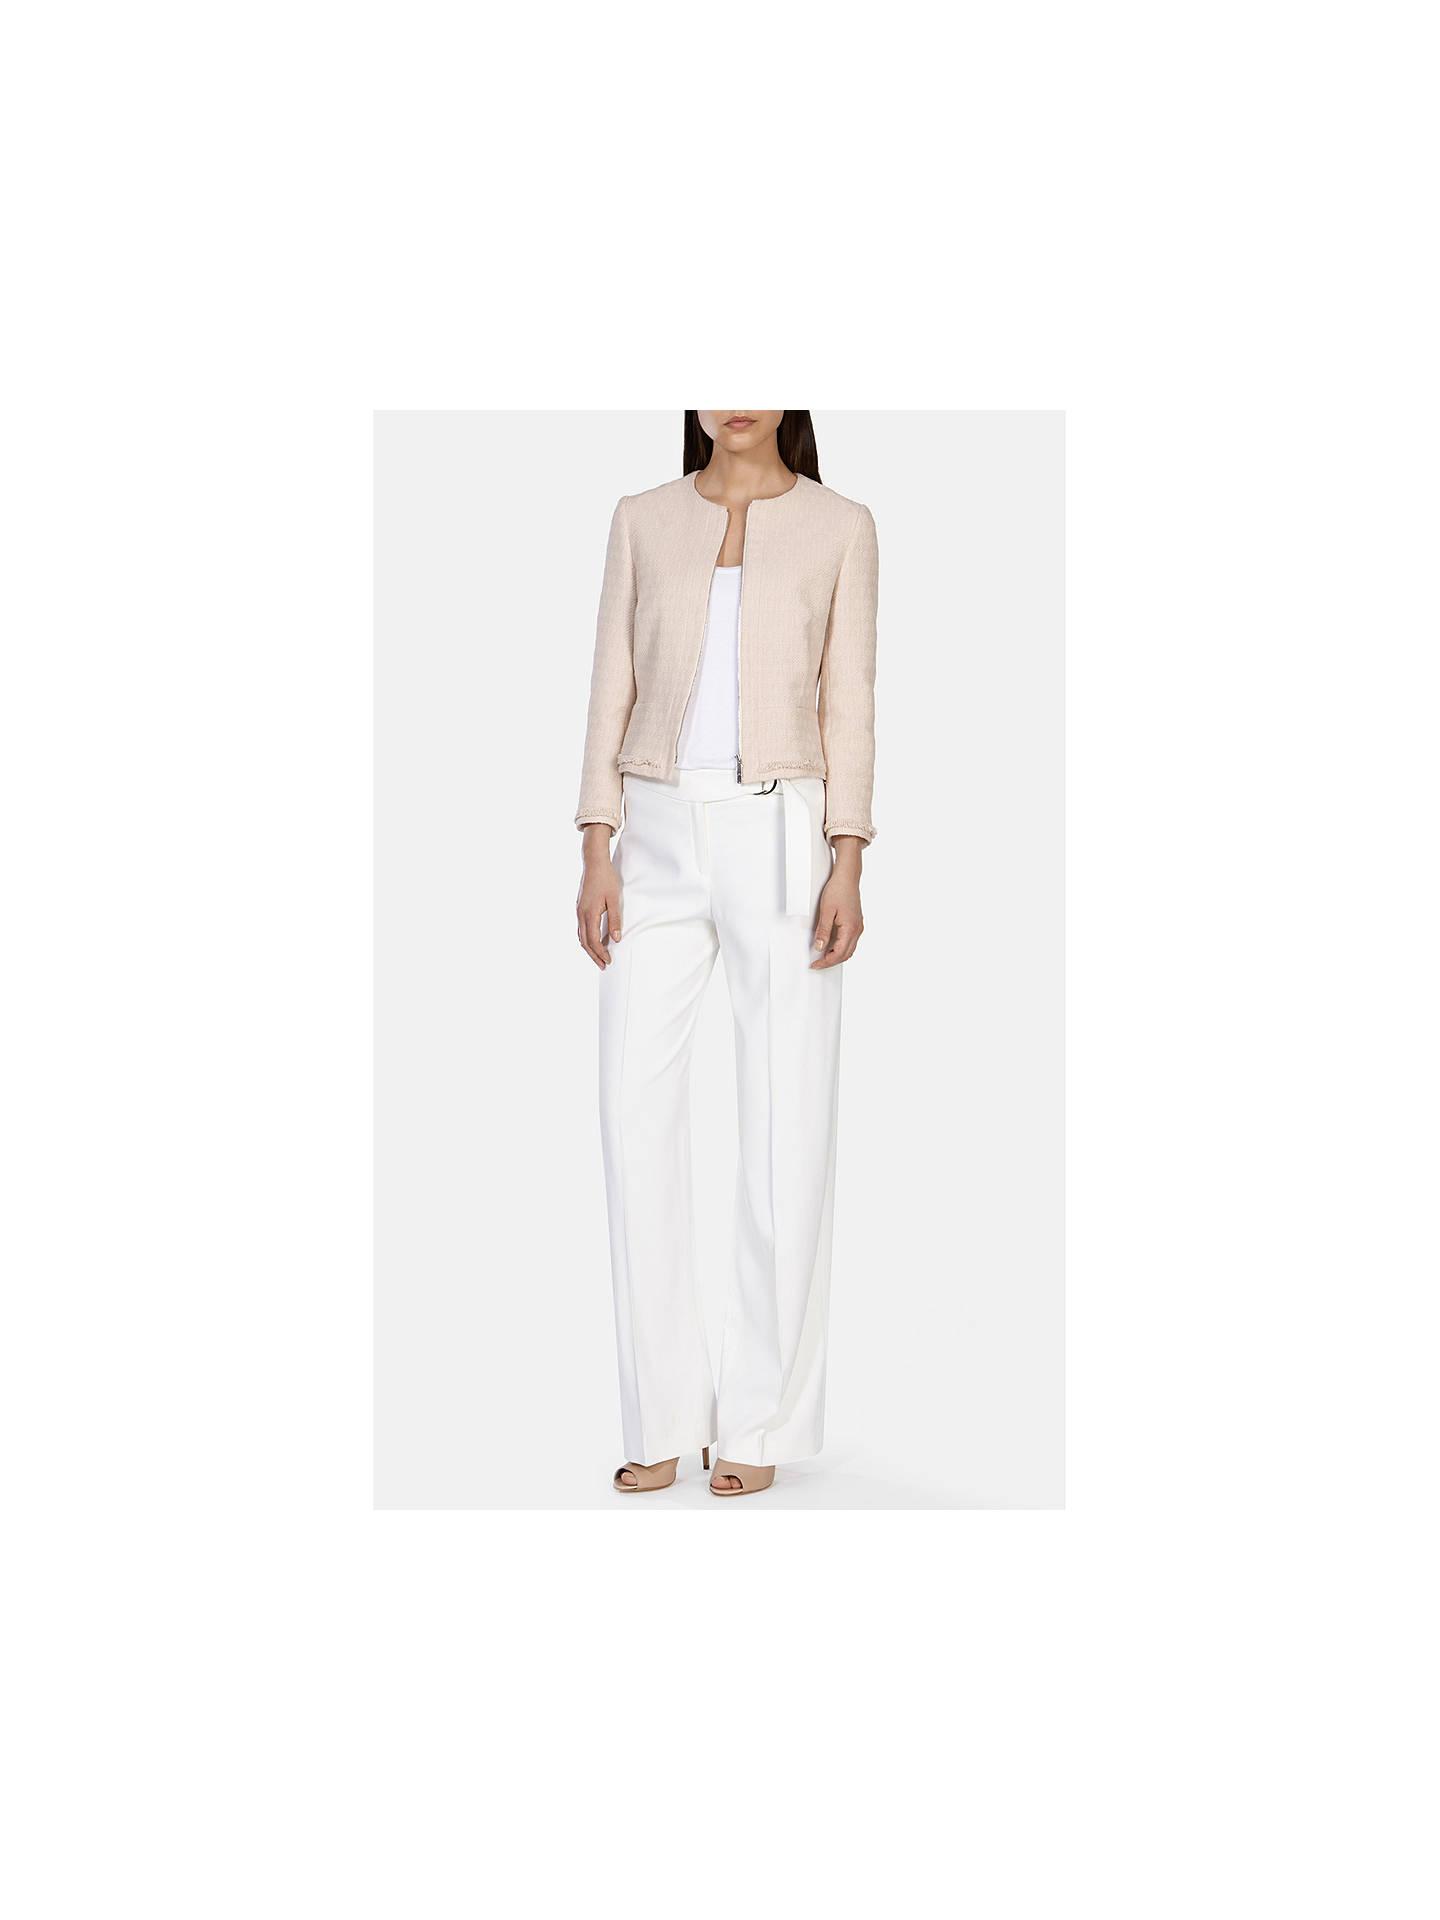 a45f78a50ad0a ... Buy Karen Millen Fringed Tweed Jacket